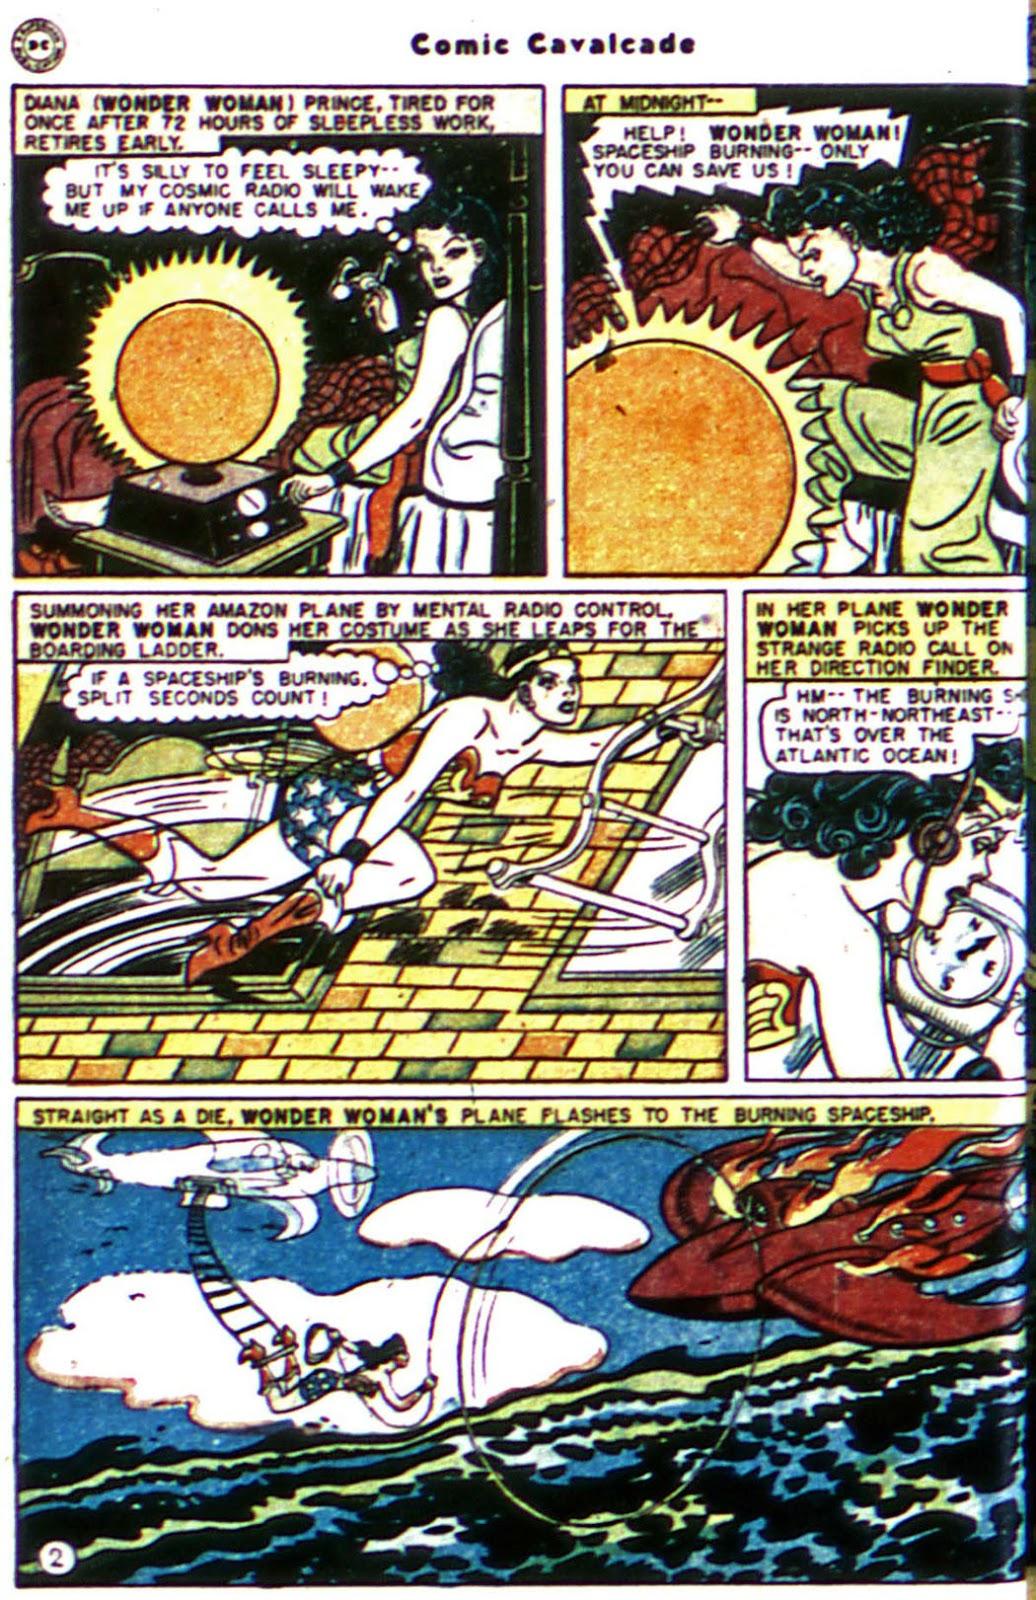 Comic Cavalcade issue 26 - Page 4